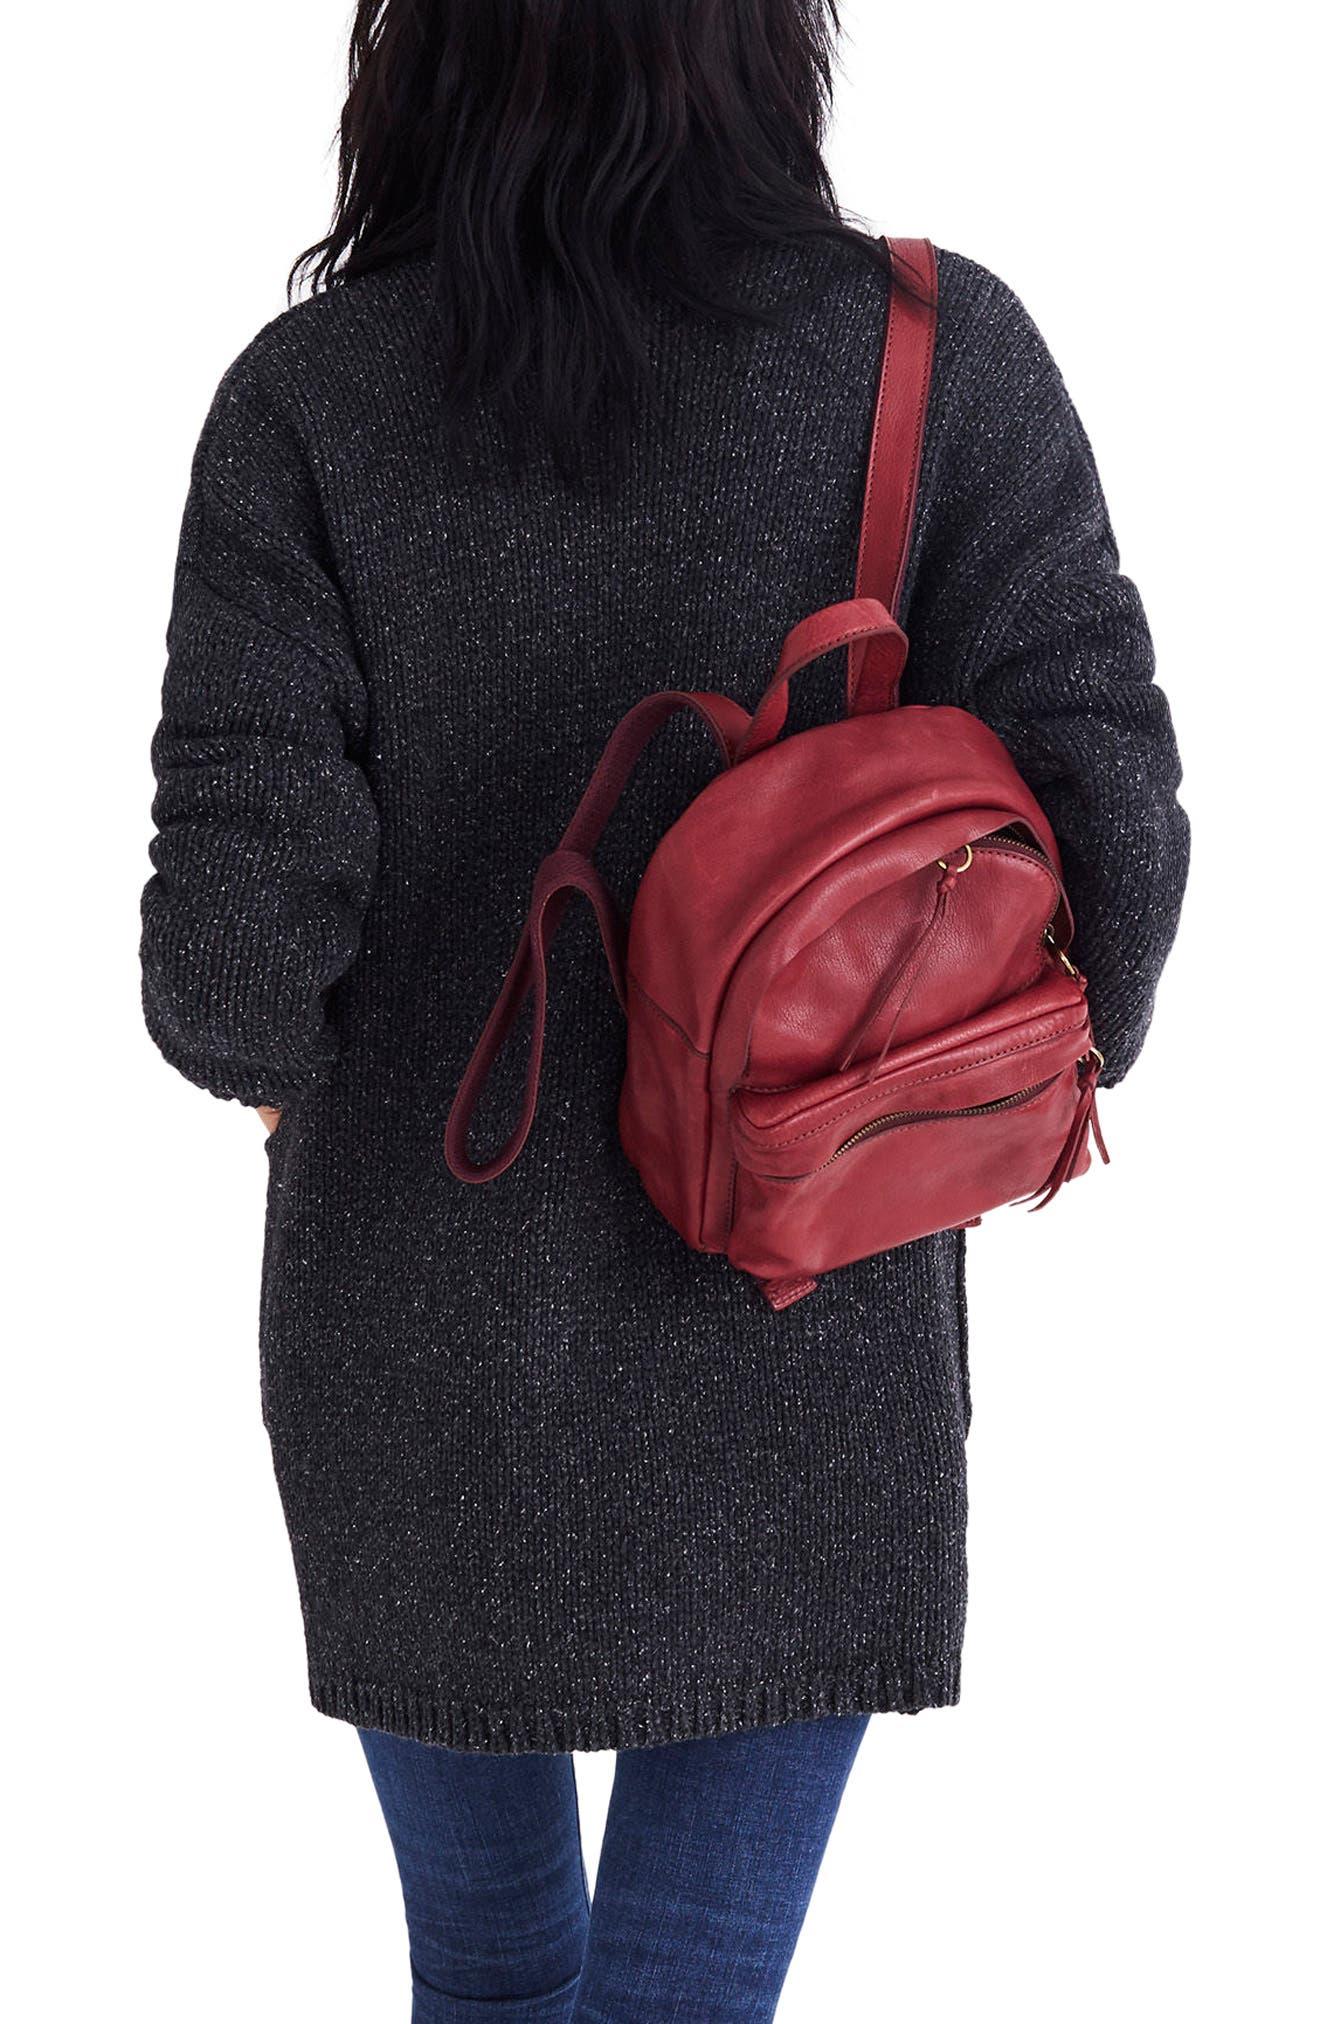 Glenhill Sweater Coat,                             Alternate thumbnail 2, color,                             001